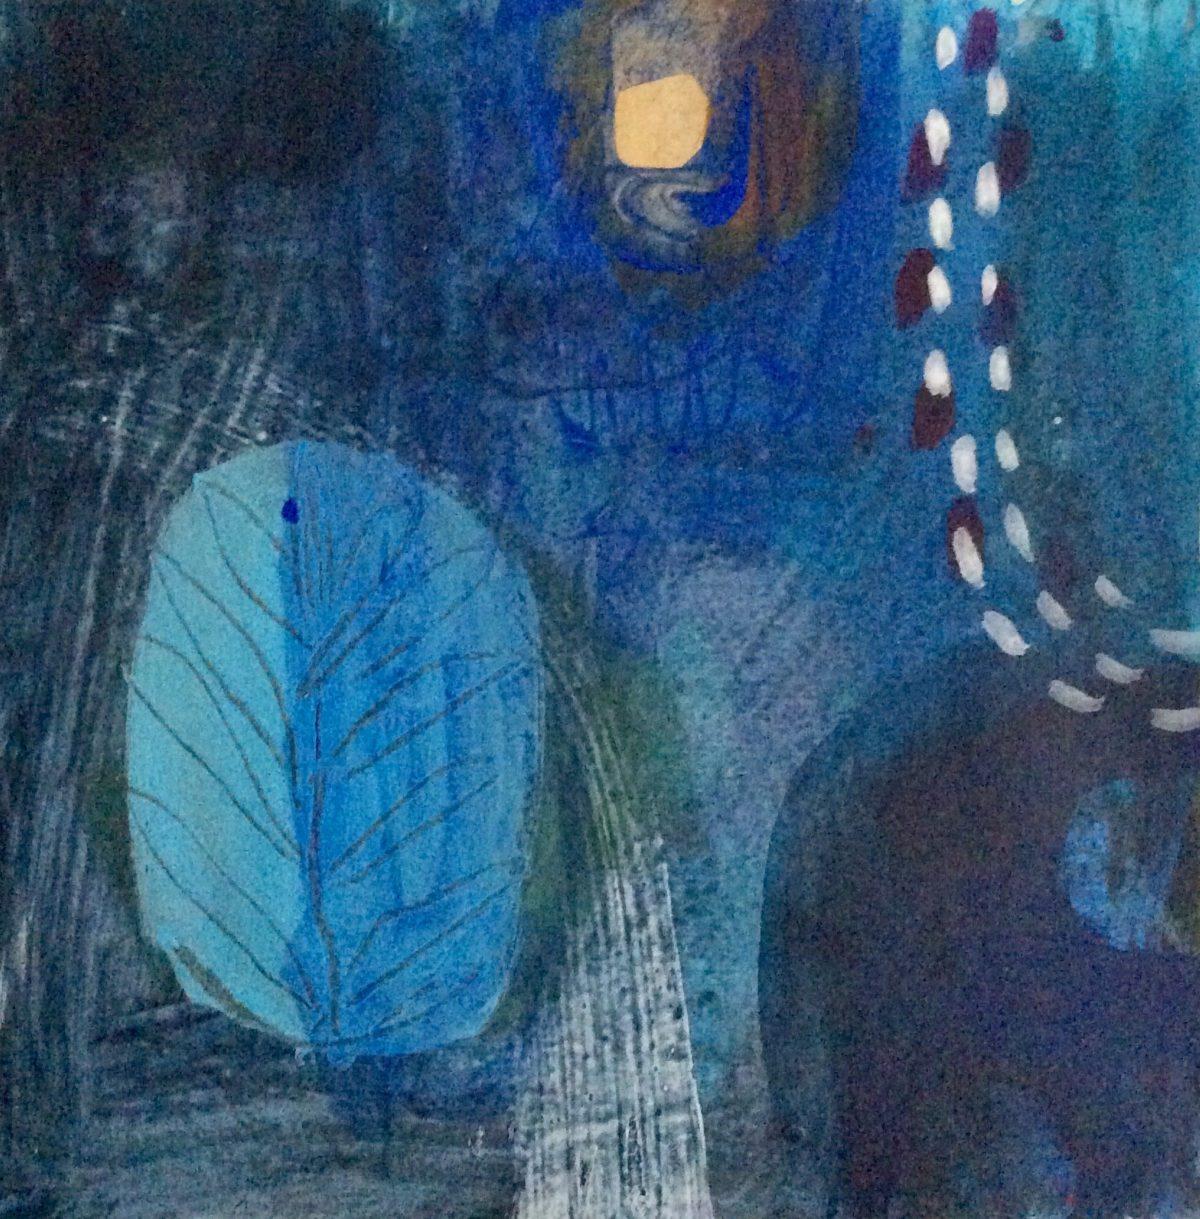 MVS Indigo Ocean 4 painting